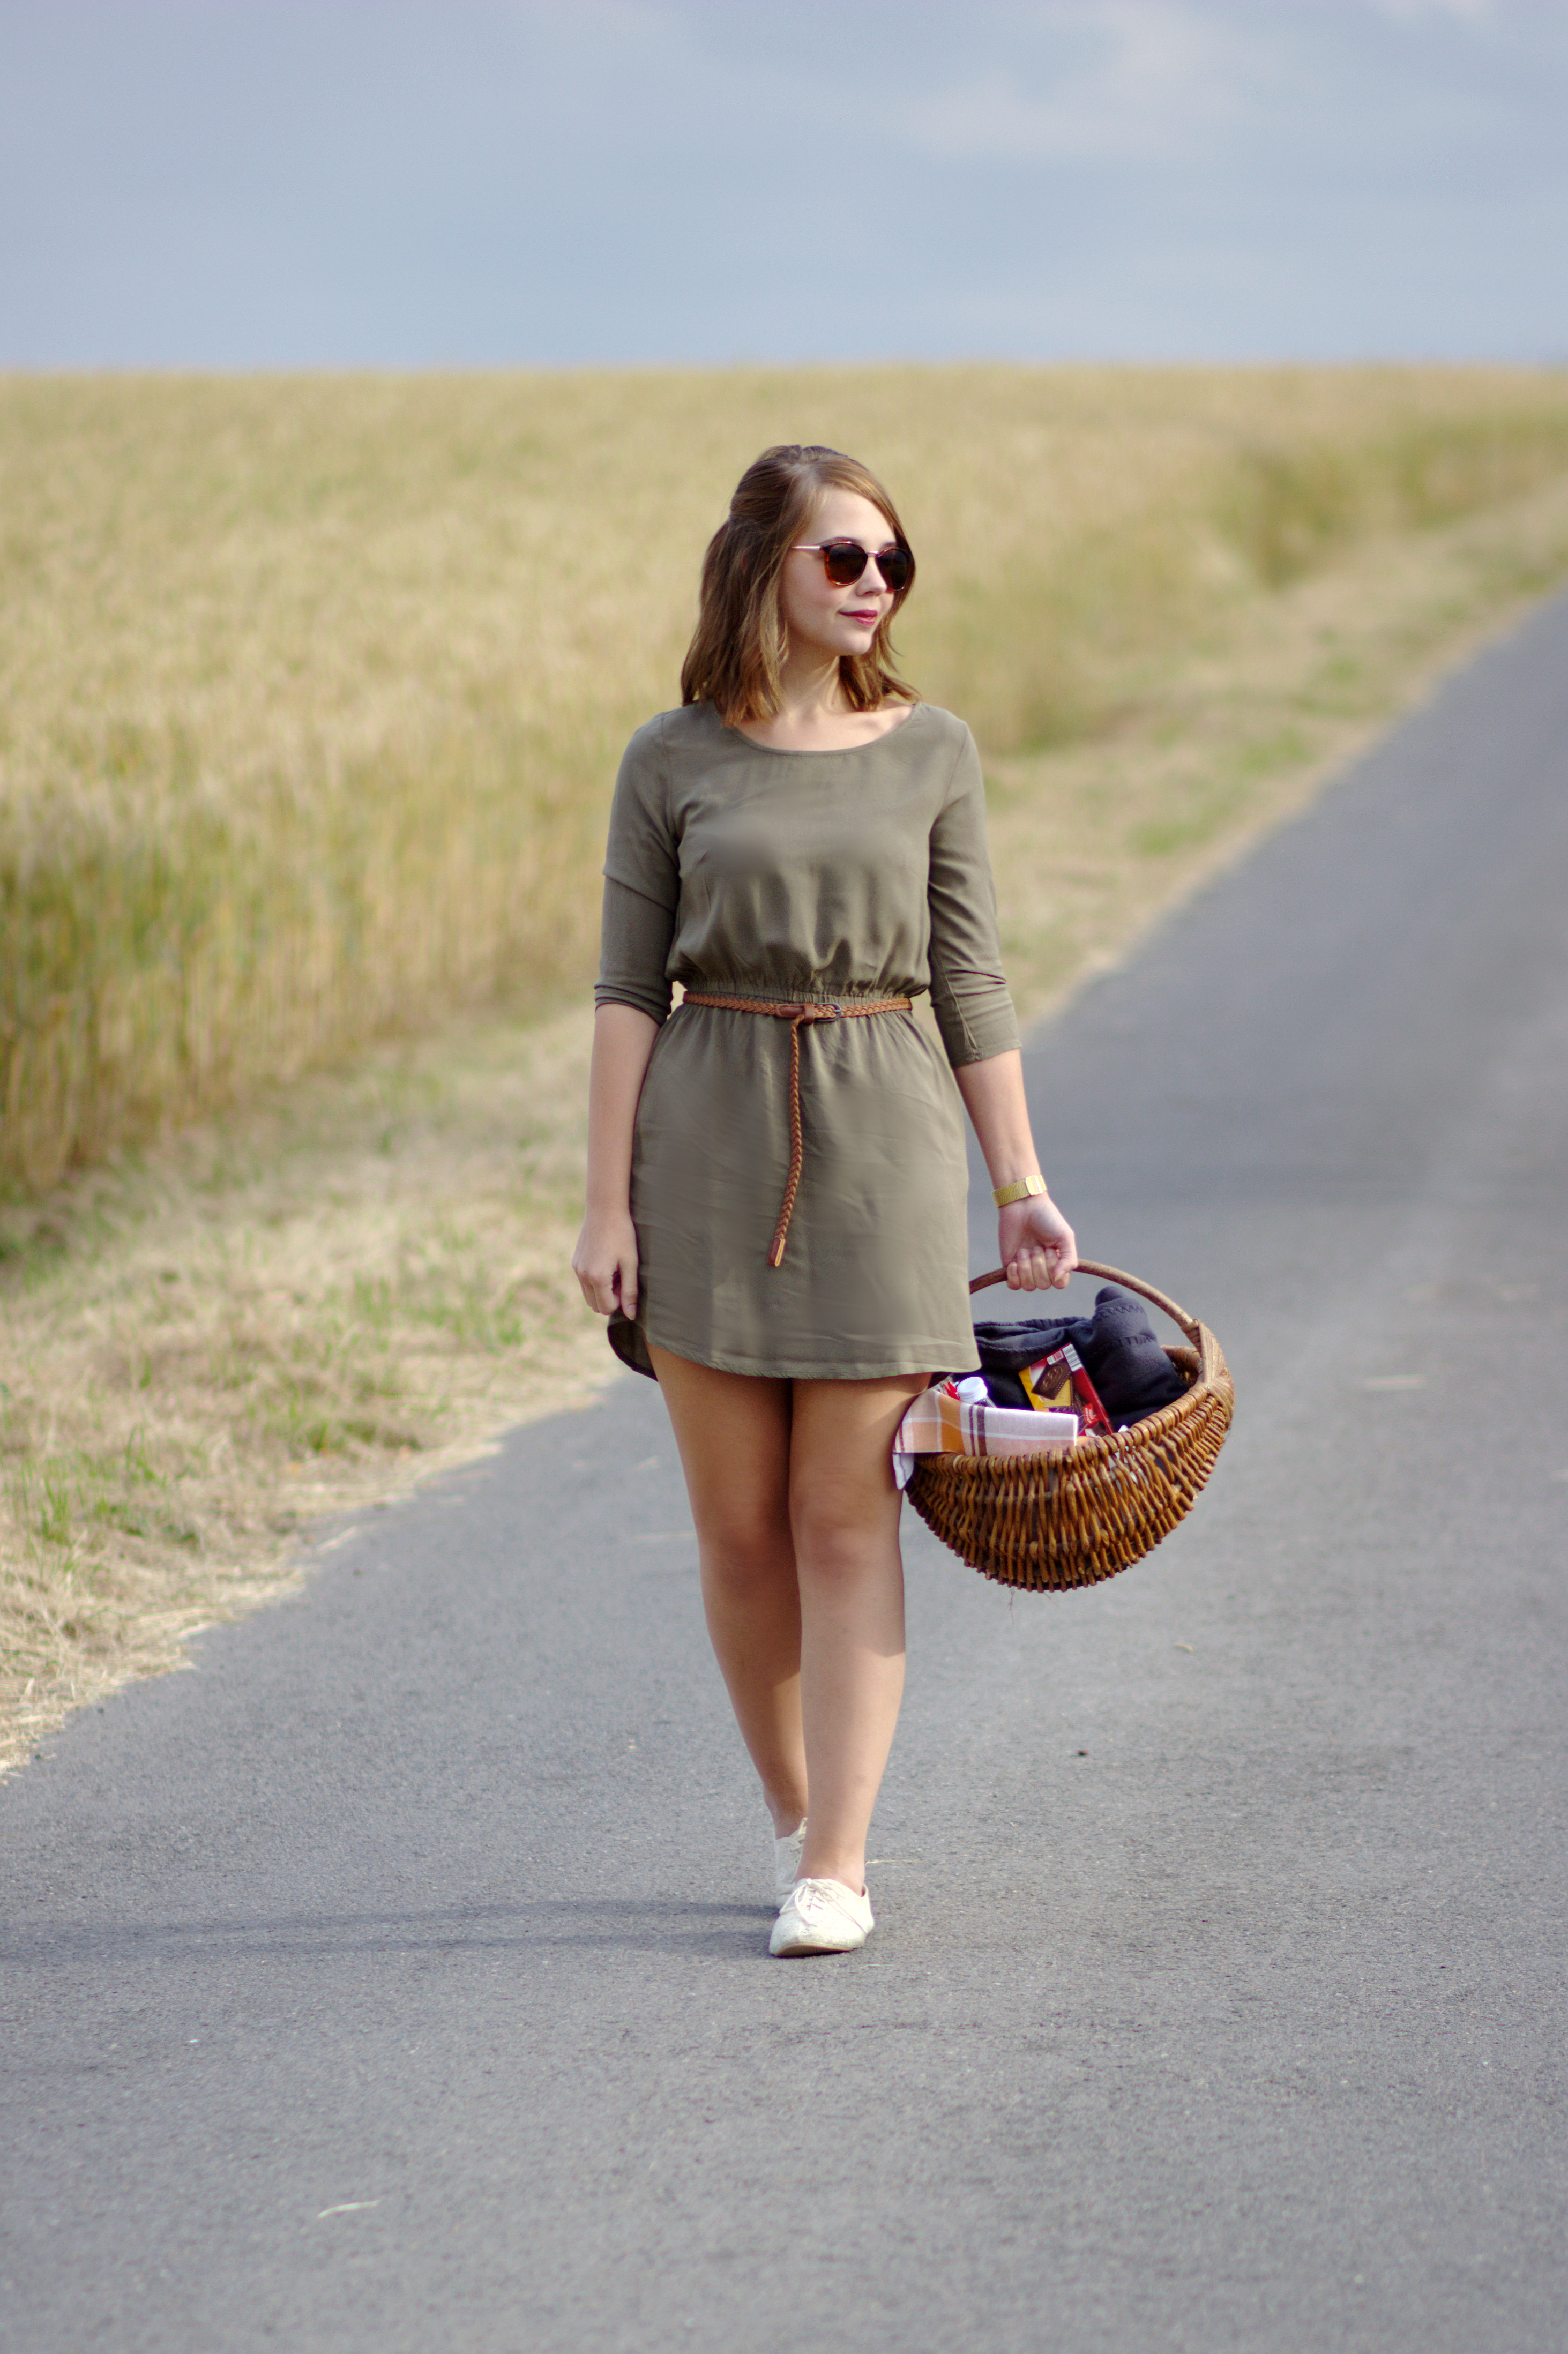 deichmann-trendblog-bezauberndenana-fashion-outfit-sommerpicknick (3)